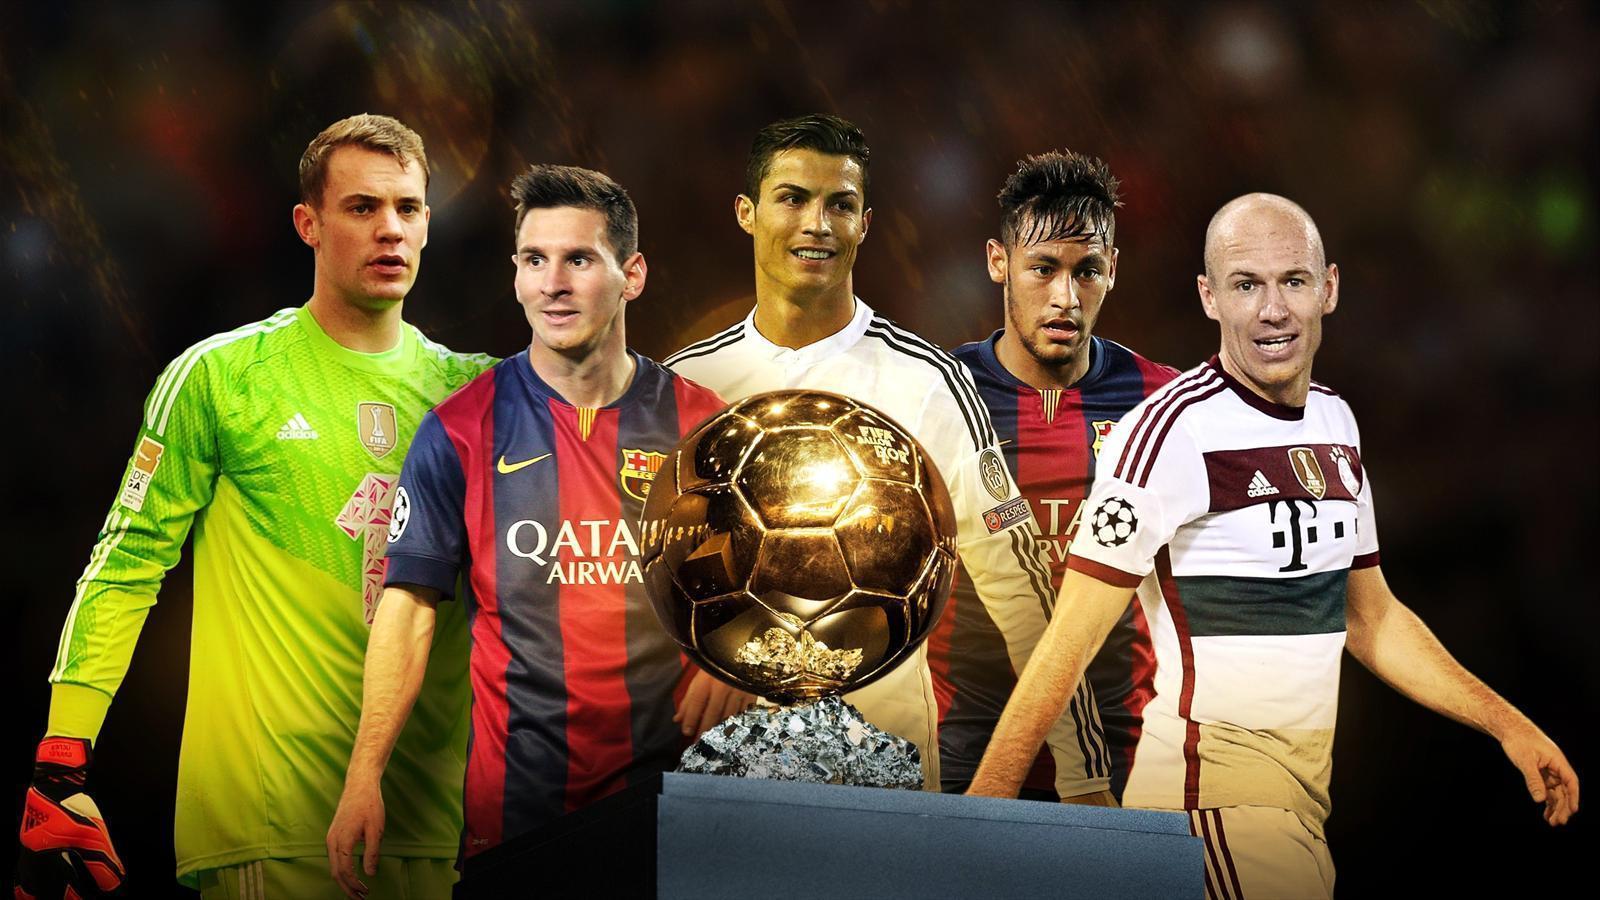 Ronaldo Vs Messi Wallpaper 2014 Ronaldo Vs Messi Wallp...